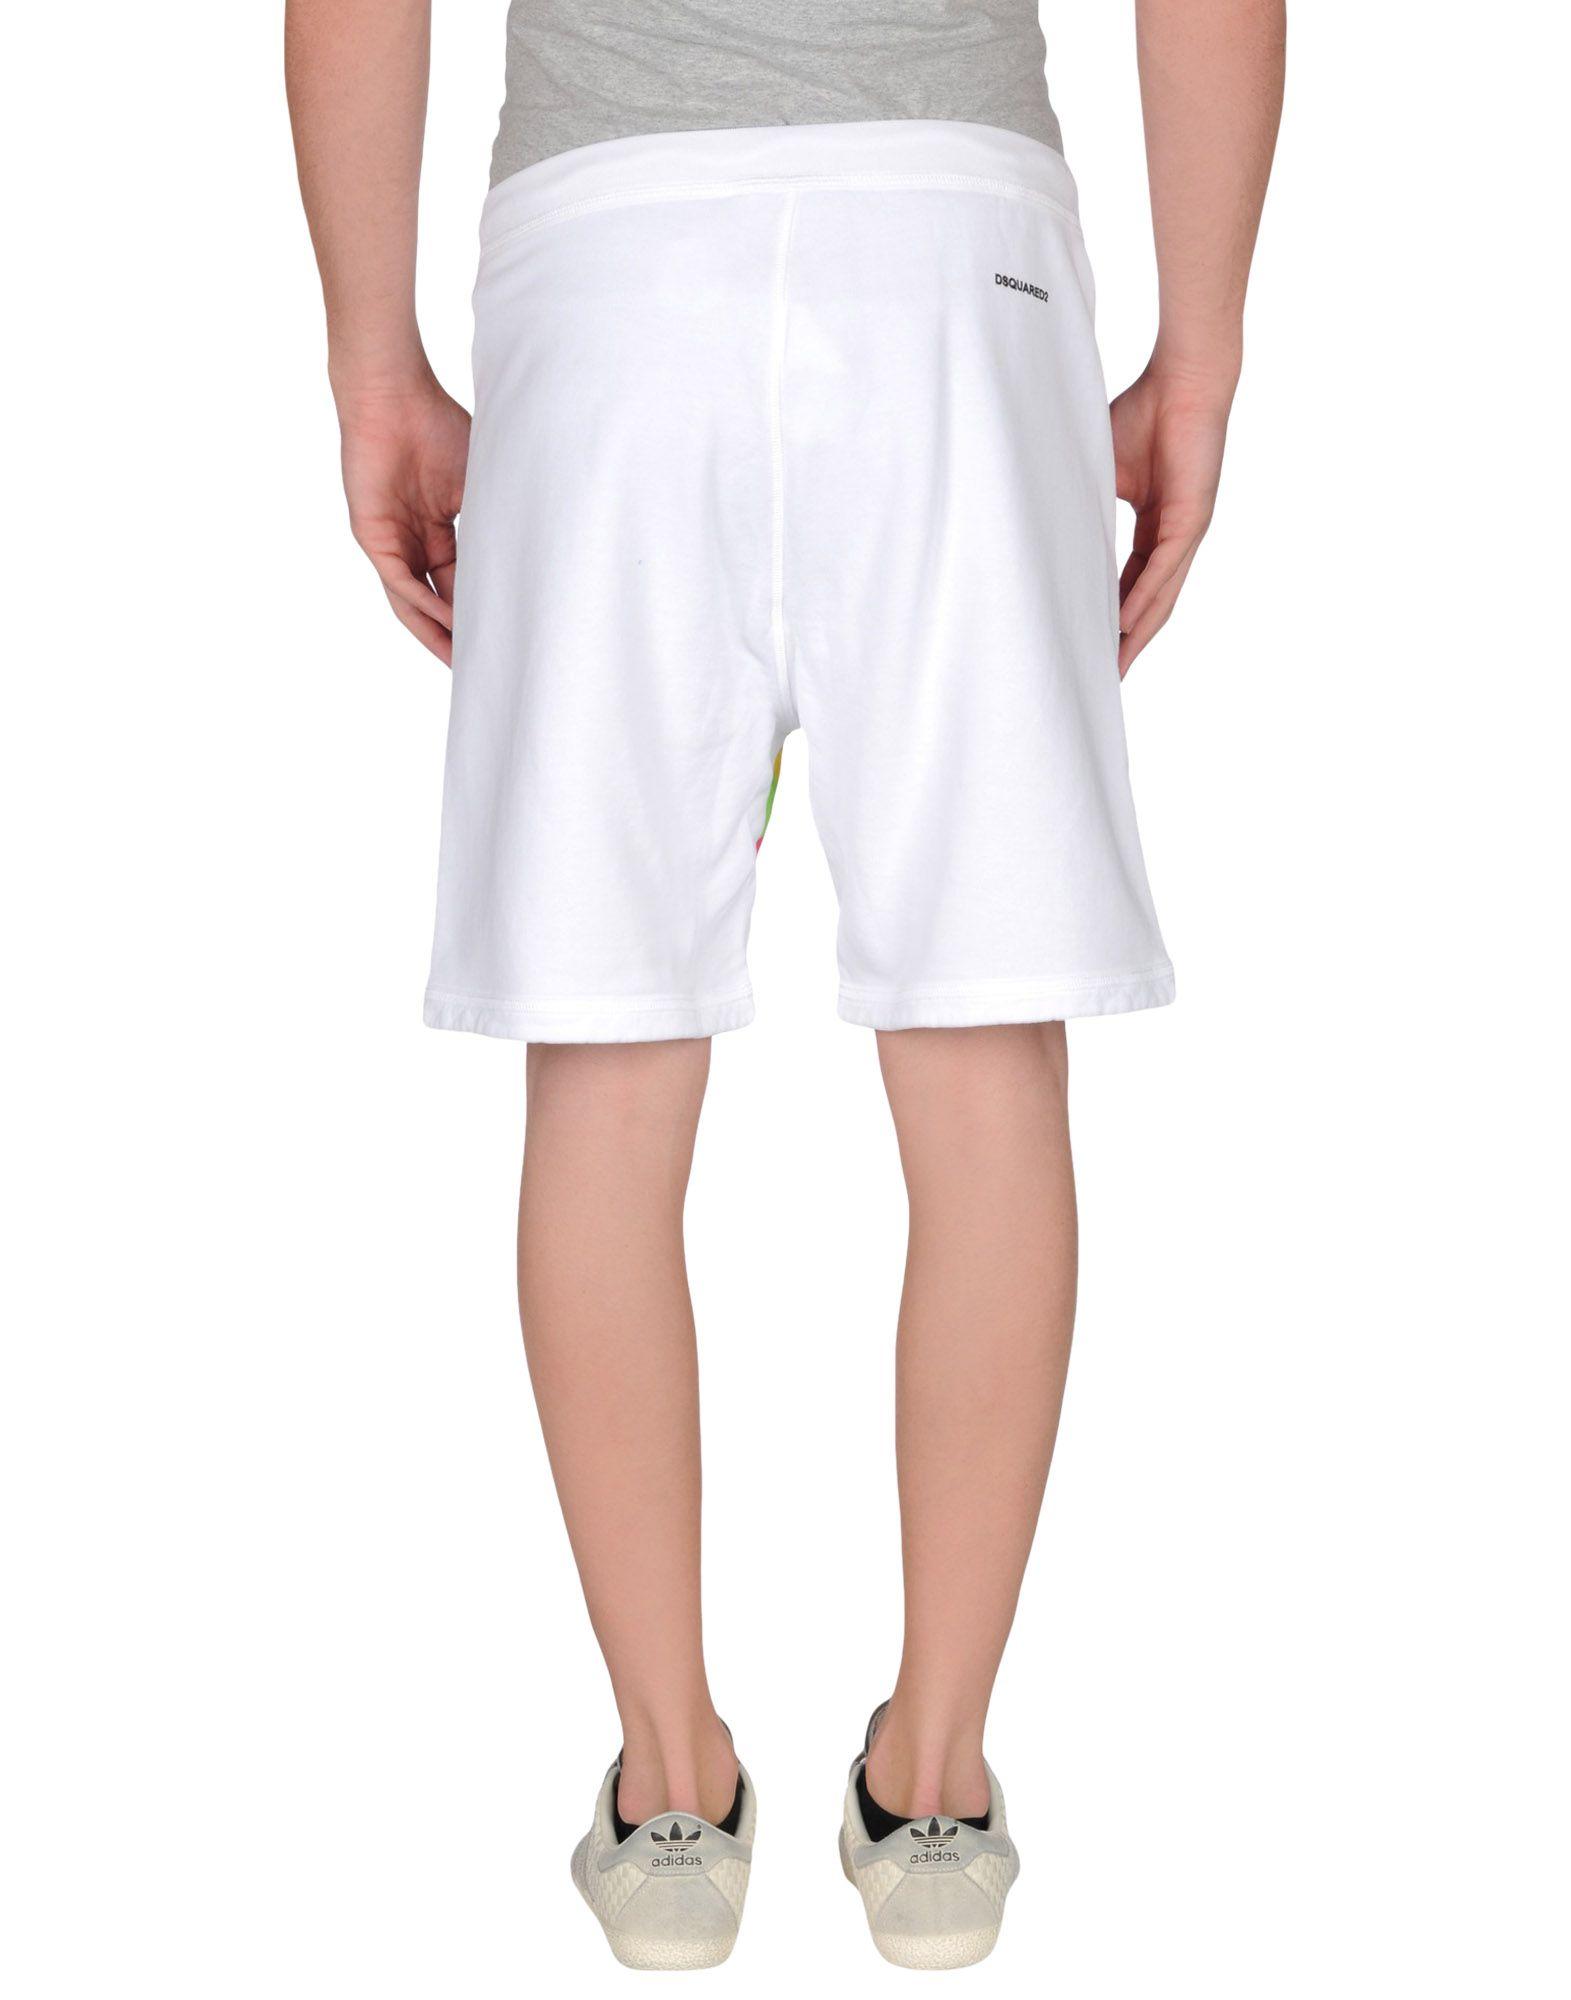 Pantalone Felpa Dsquarosso2 Uomo 36748577JQ - 36748577JQ Uomo 83239b